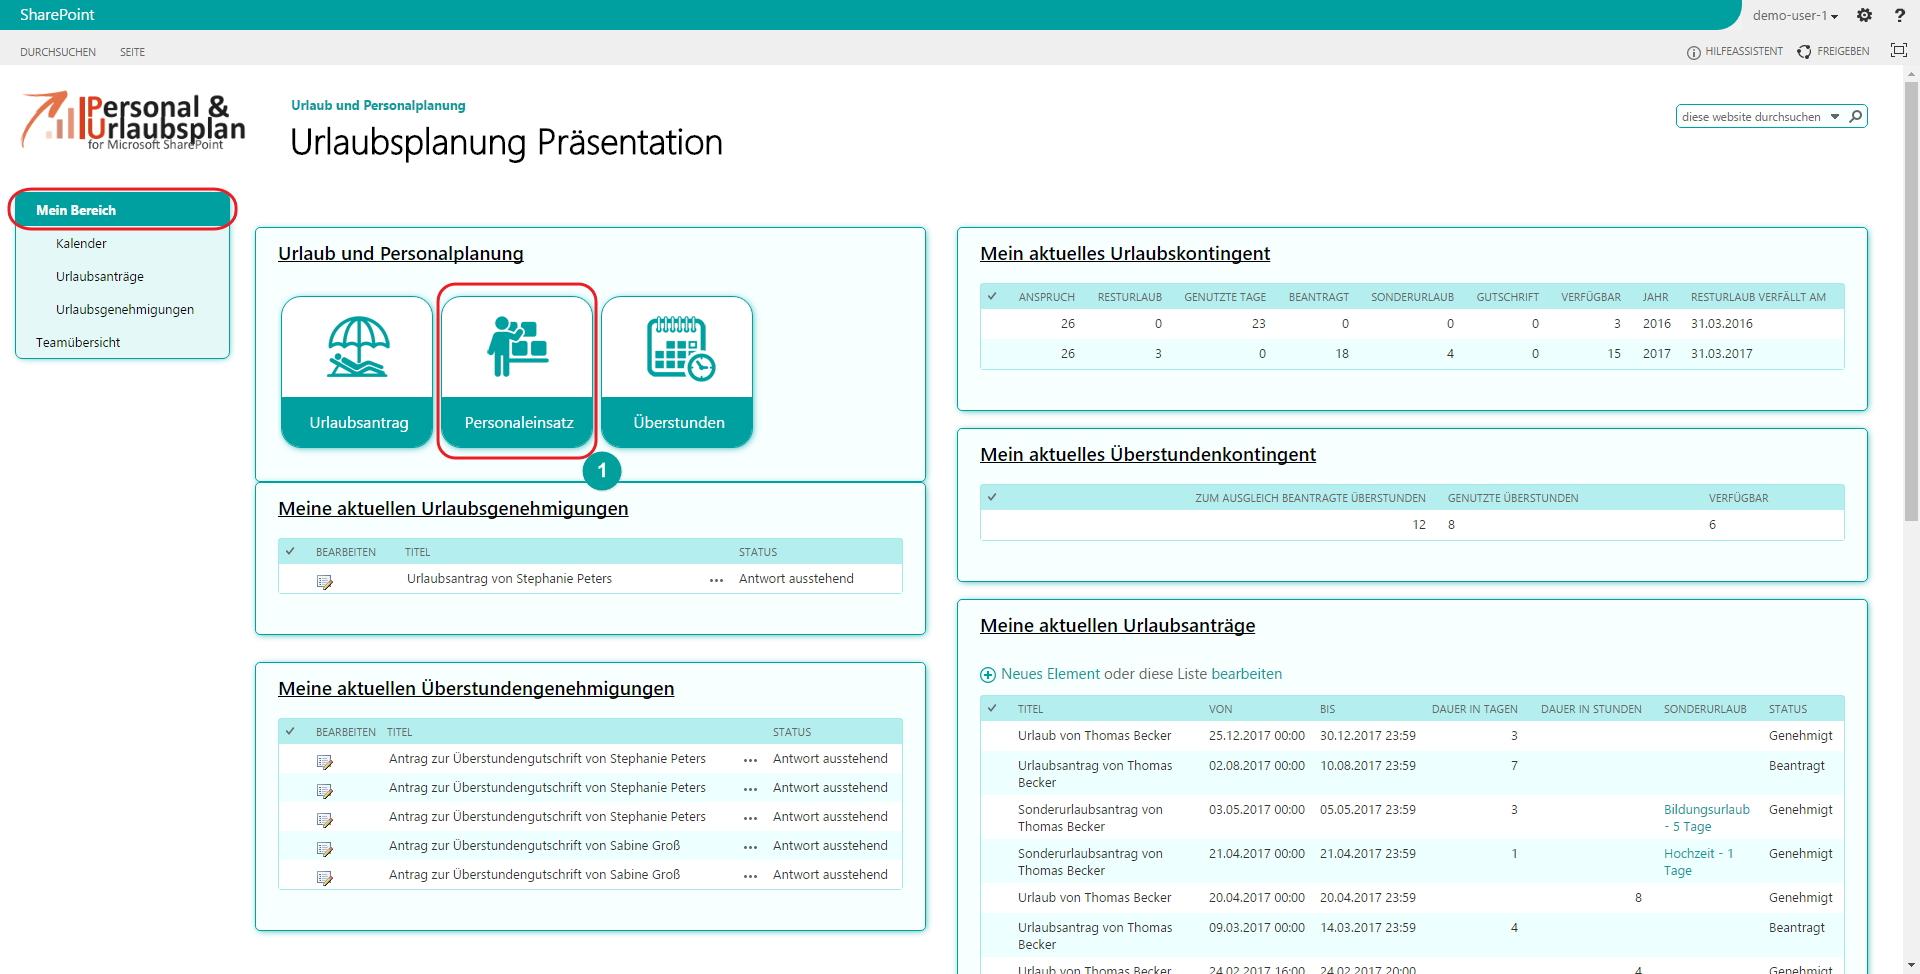 Urlaubsplanung SharePoint Personaleinsatz Planung Formular